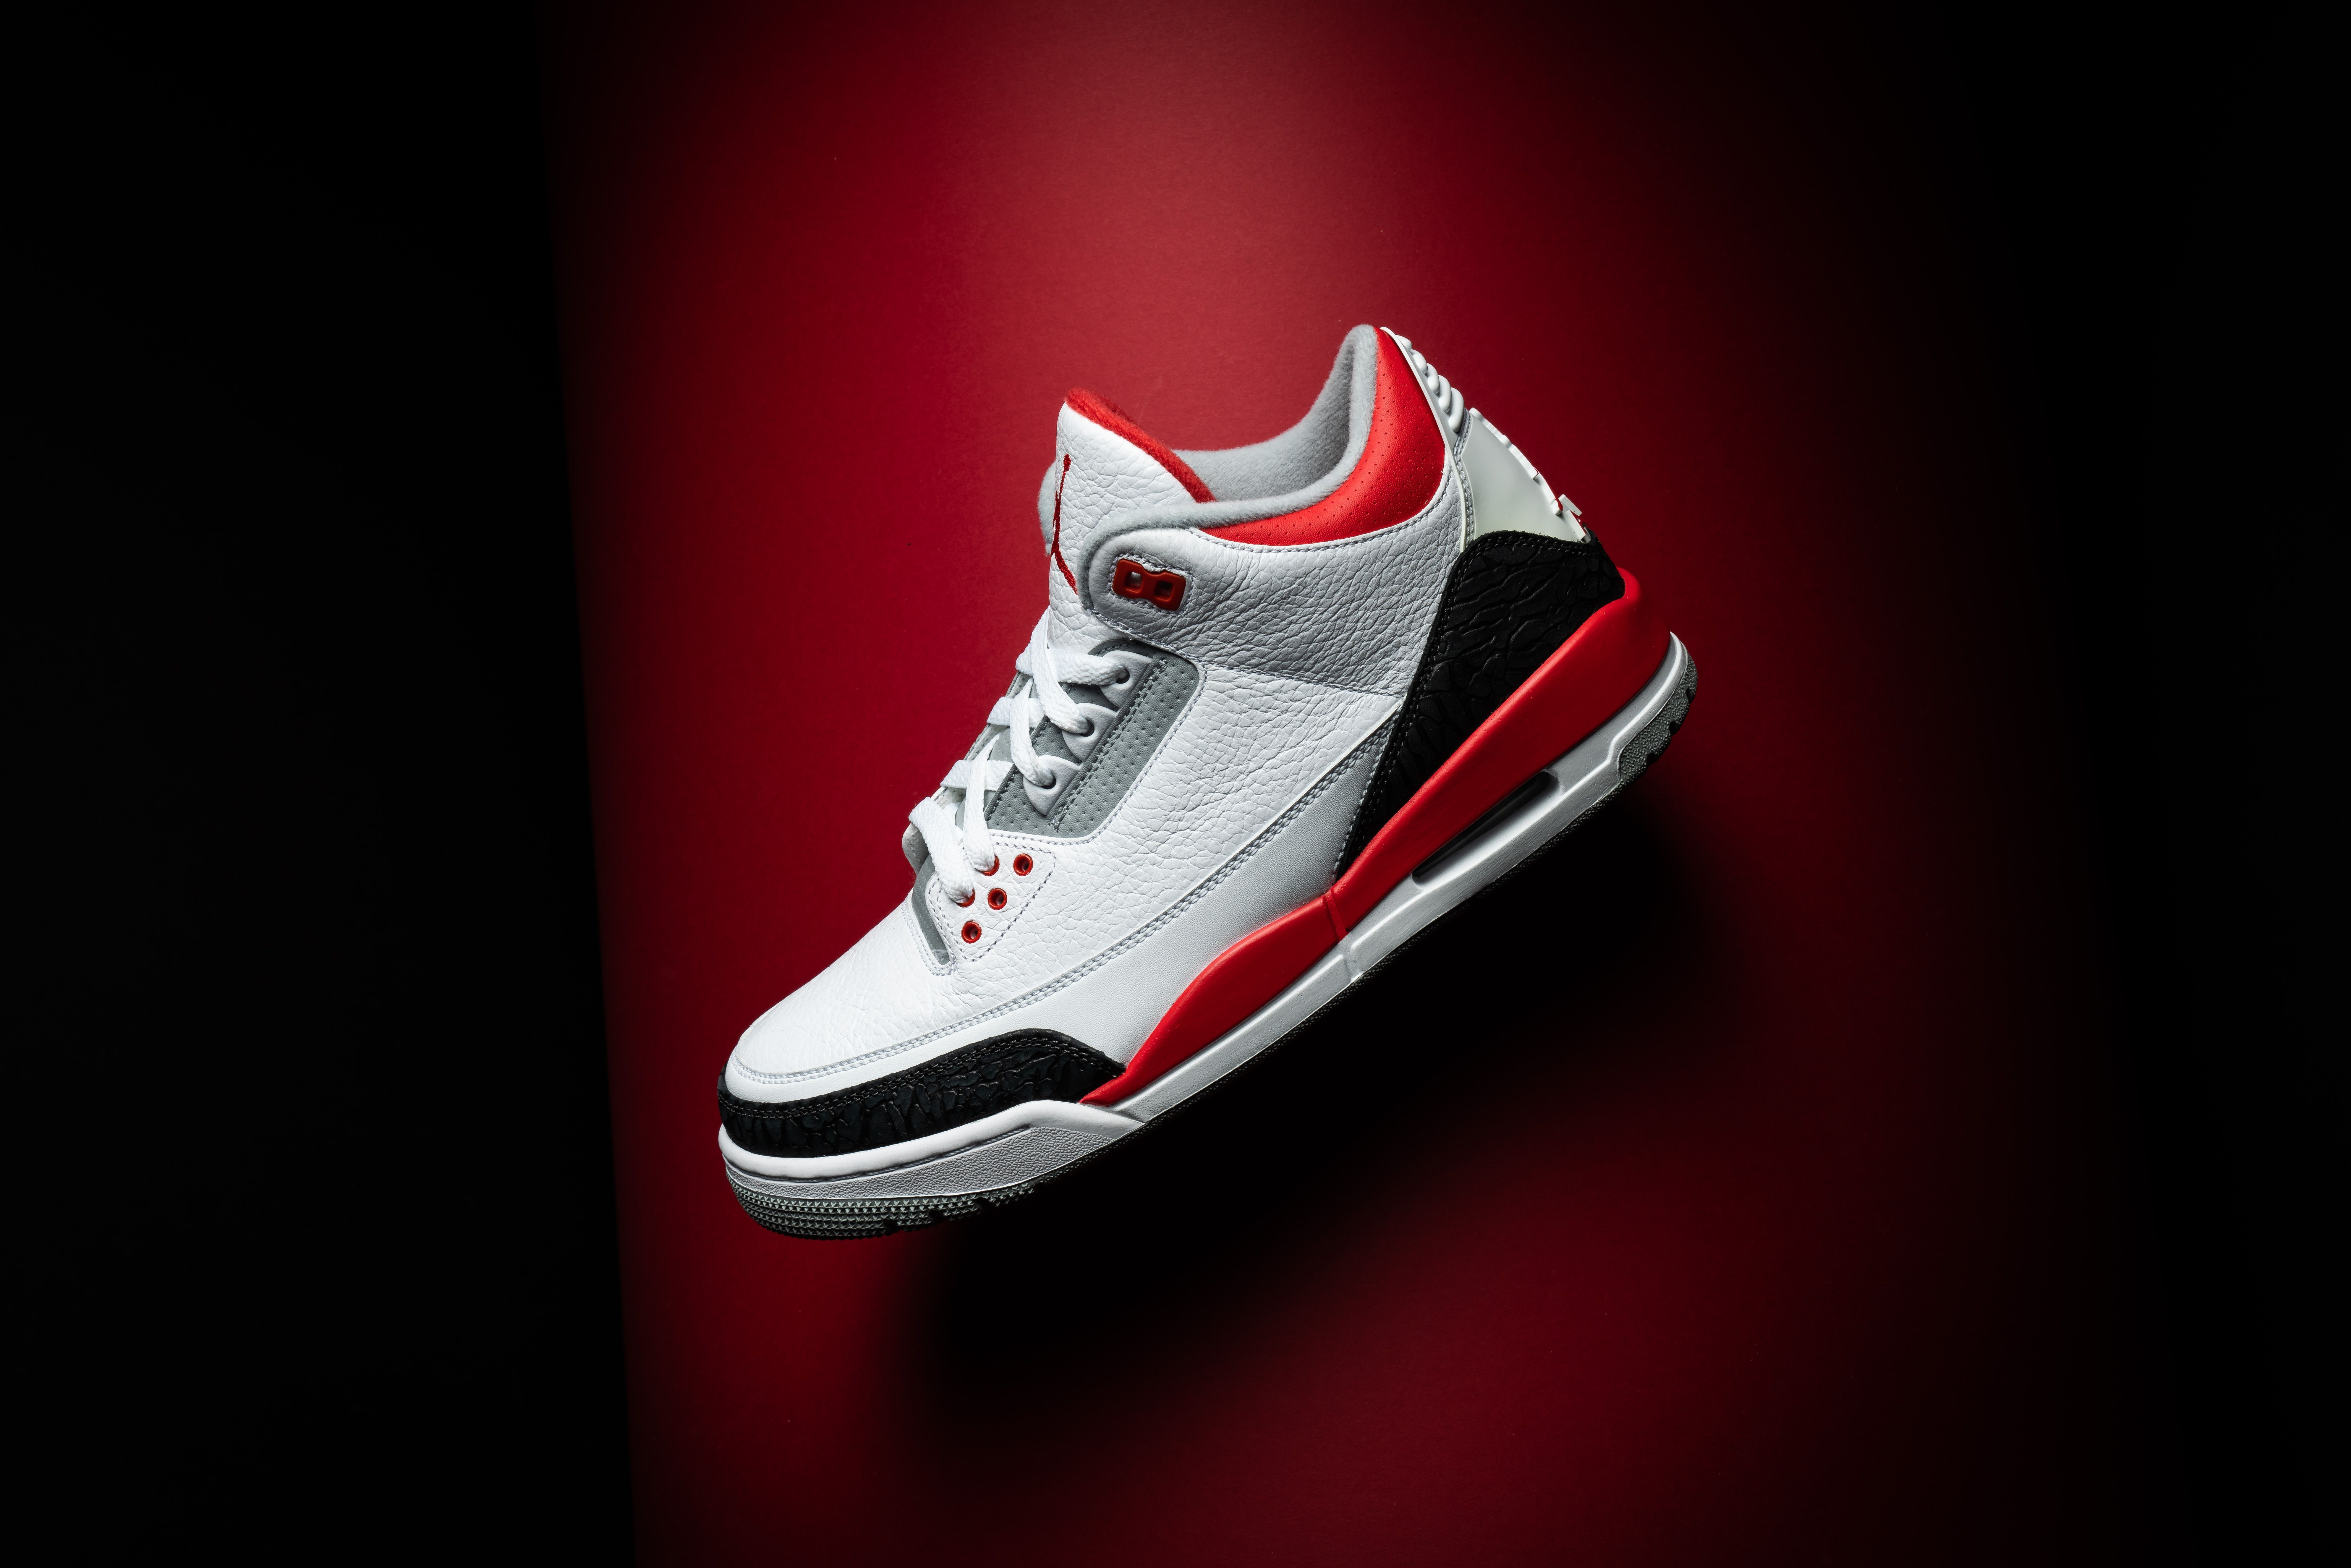 Details about Nike Air Jordan III 3 Tinker Hatfield Size 11